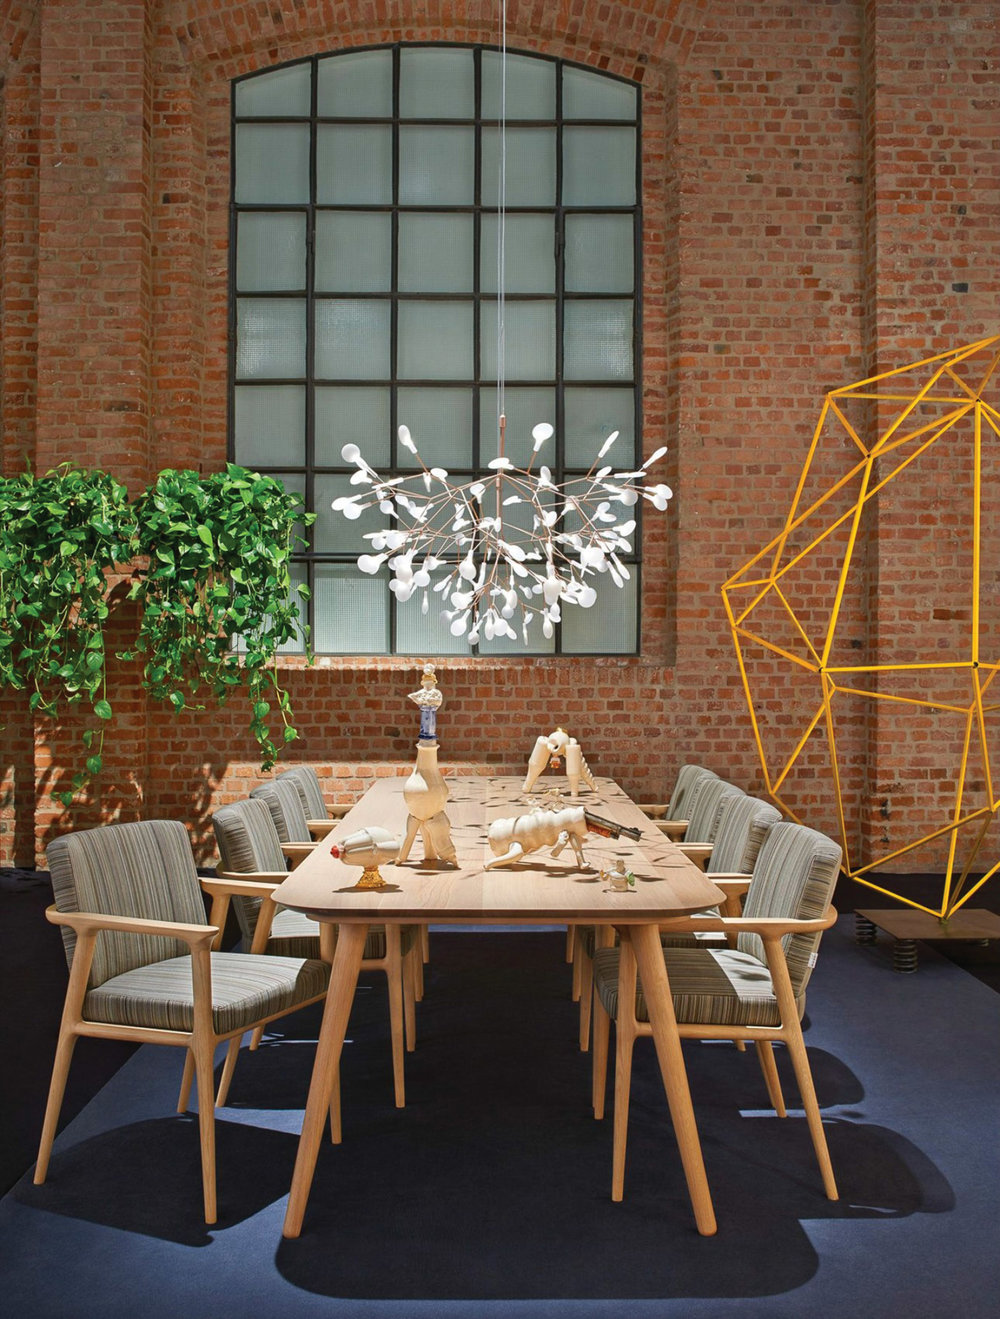 木質現代設計餐桌 $6,891  餐椅 $1,858  At Livingspace, (877) 683-1116,  livingspace.com